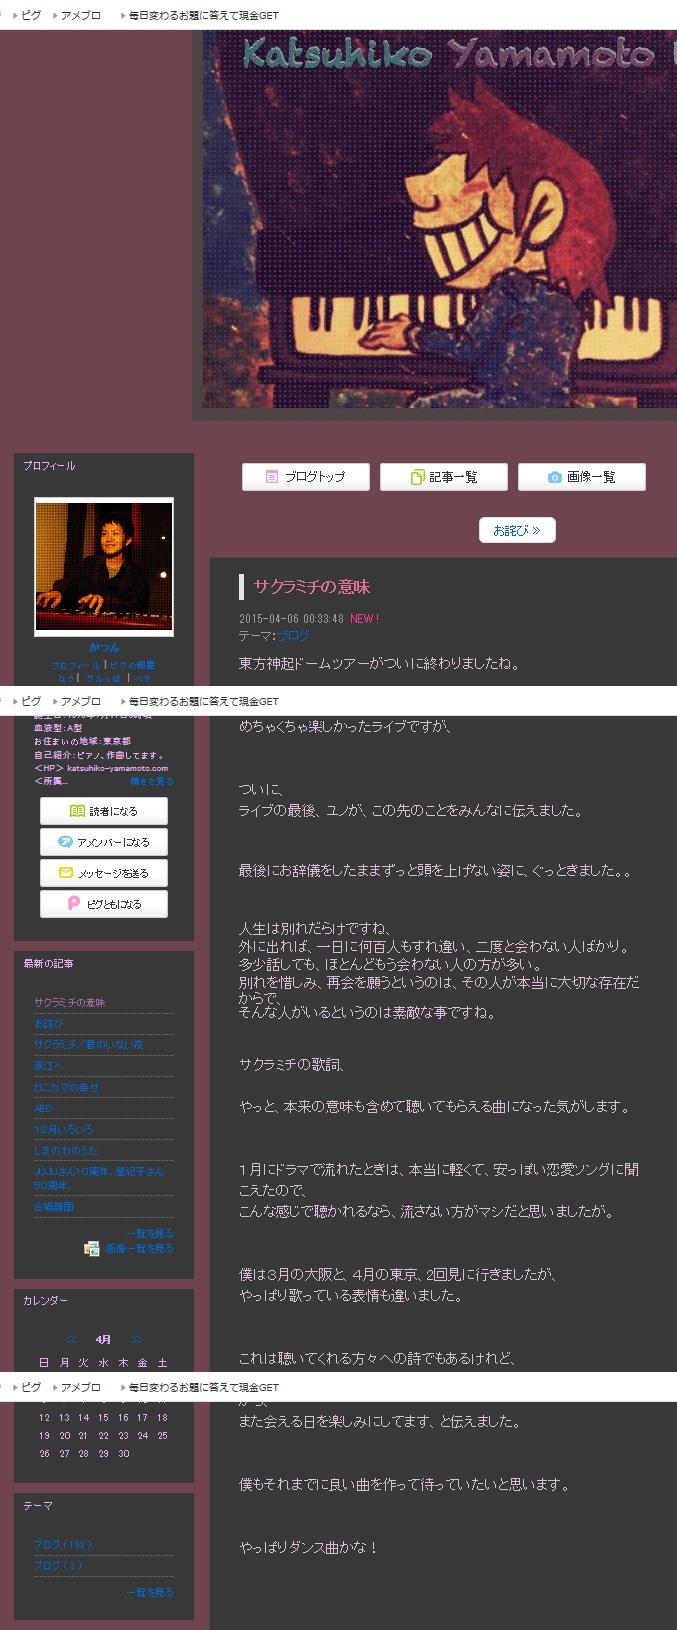 ameblo_jp_20150406_075731.jpg